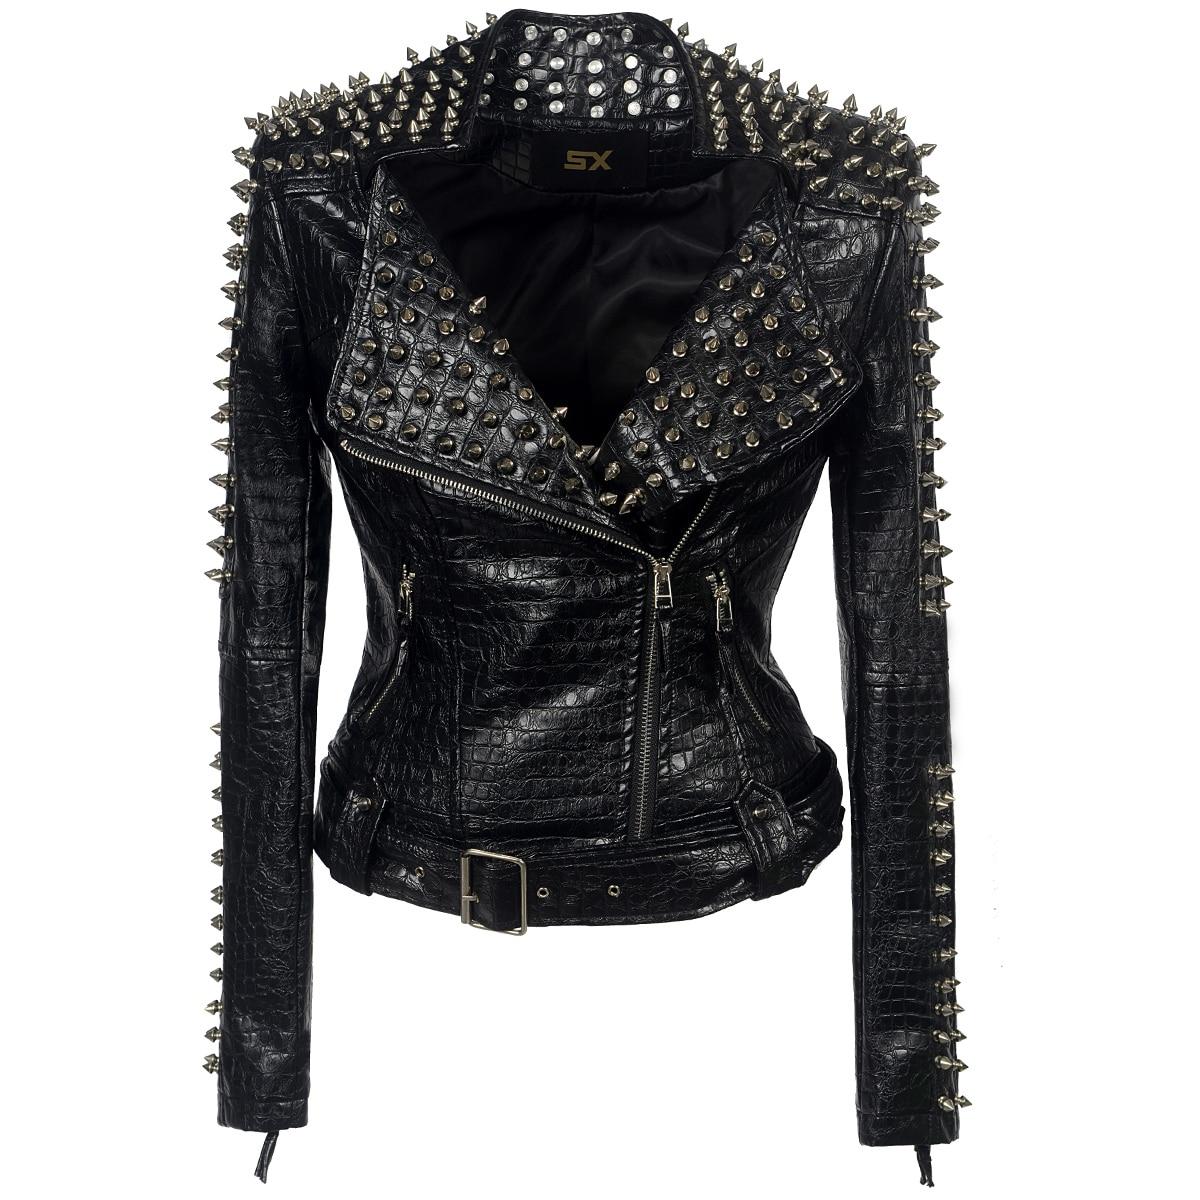 Chaqueta corta de piel sintética con remaches Punk para mujer, chaqueta negra...